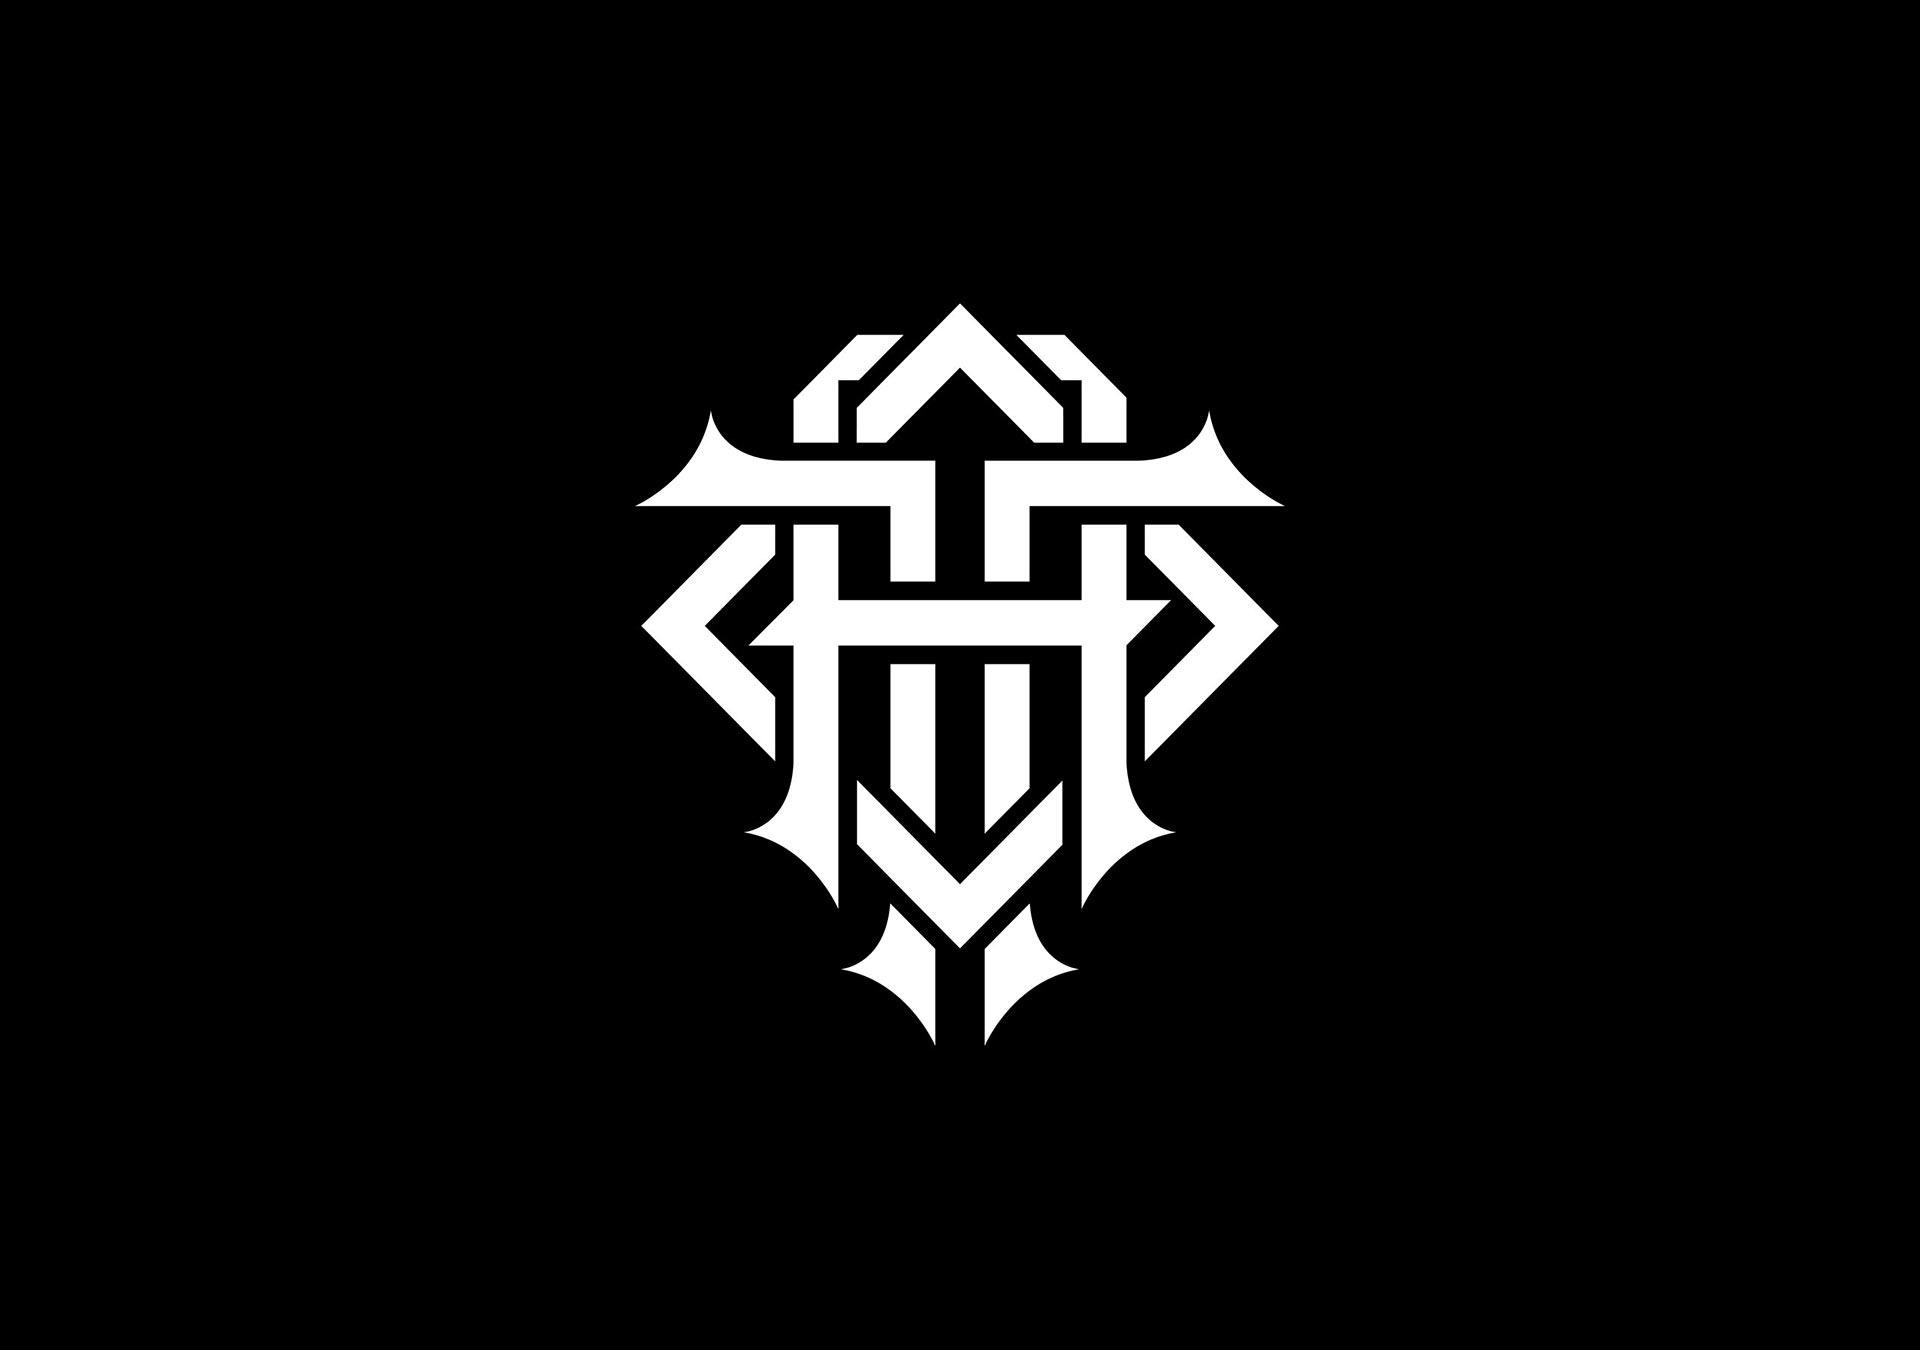 music logos april77 creative musician album business